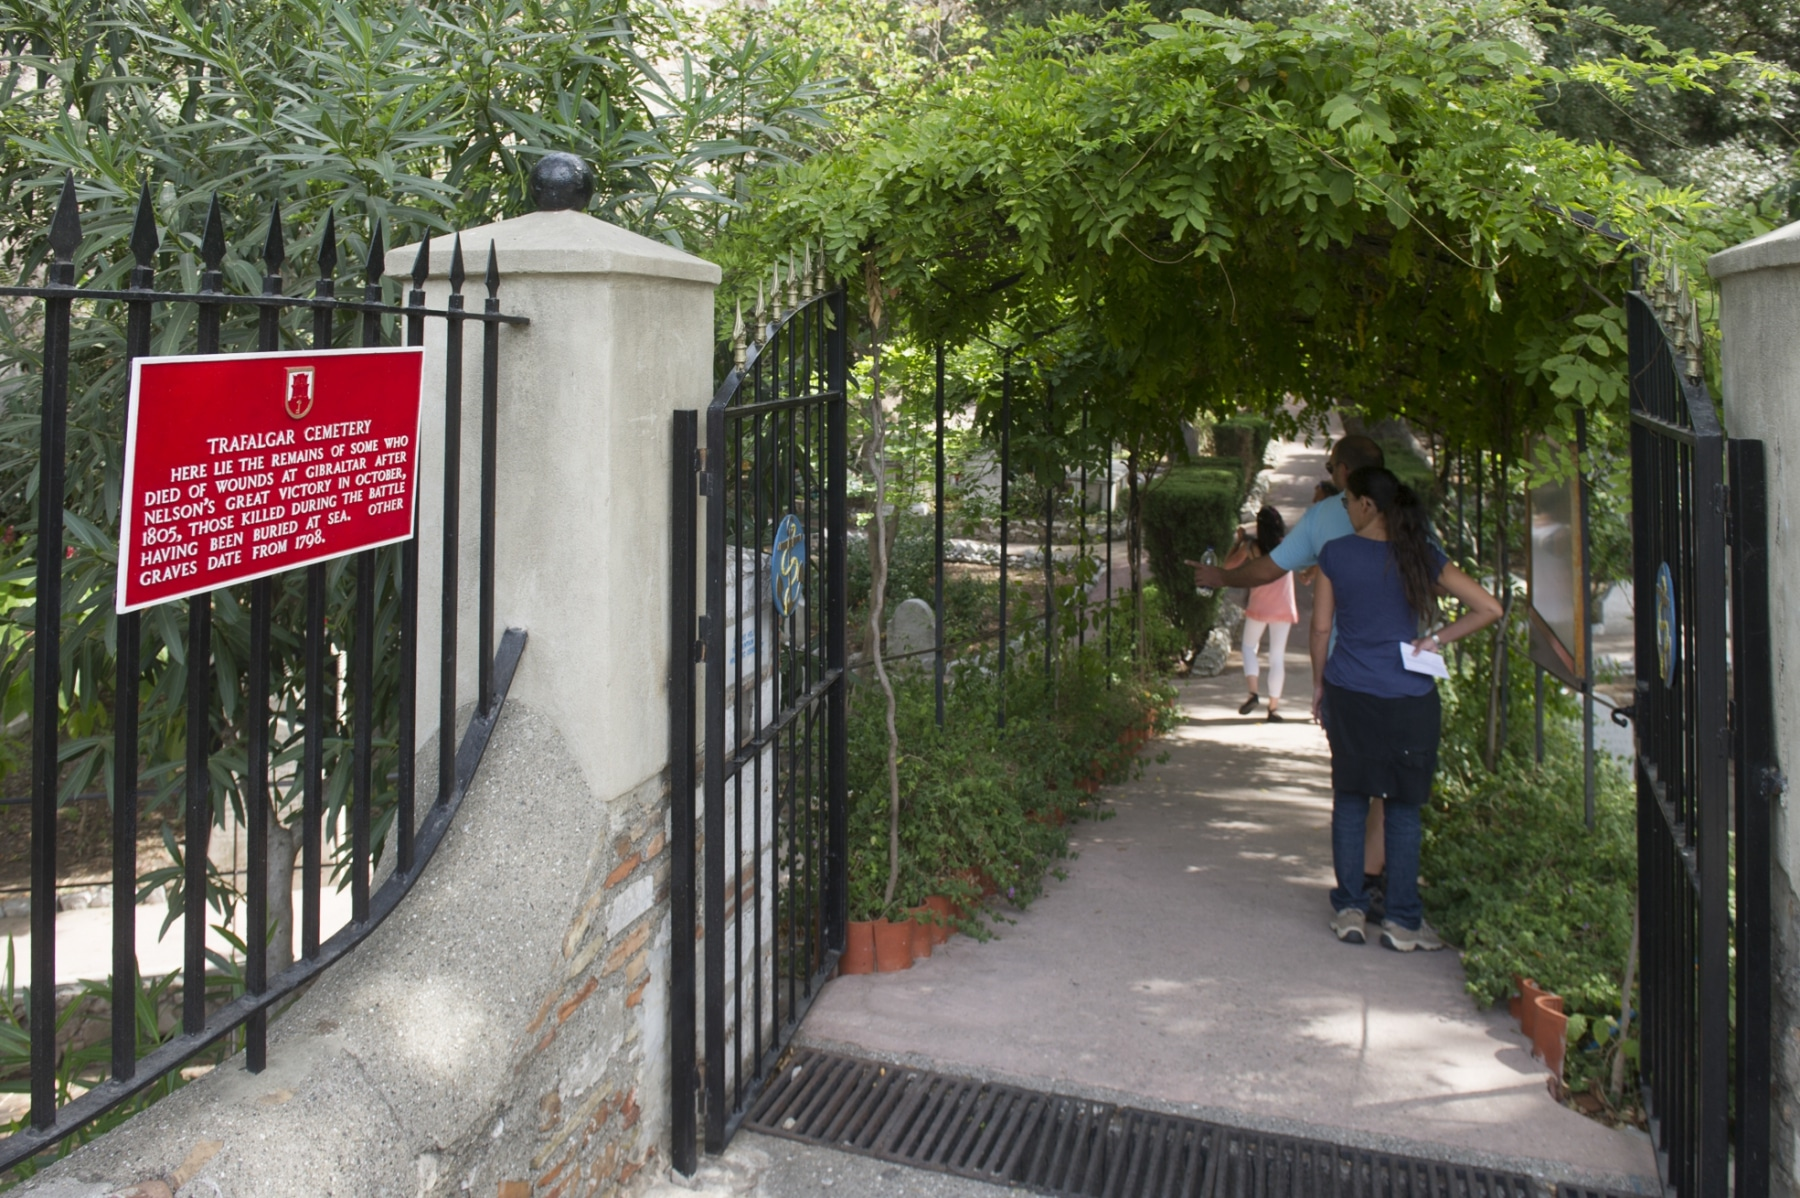 la-entrada-al-cementerio-de-trafalgar-de-gibraltar_22119062523_o